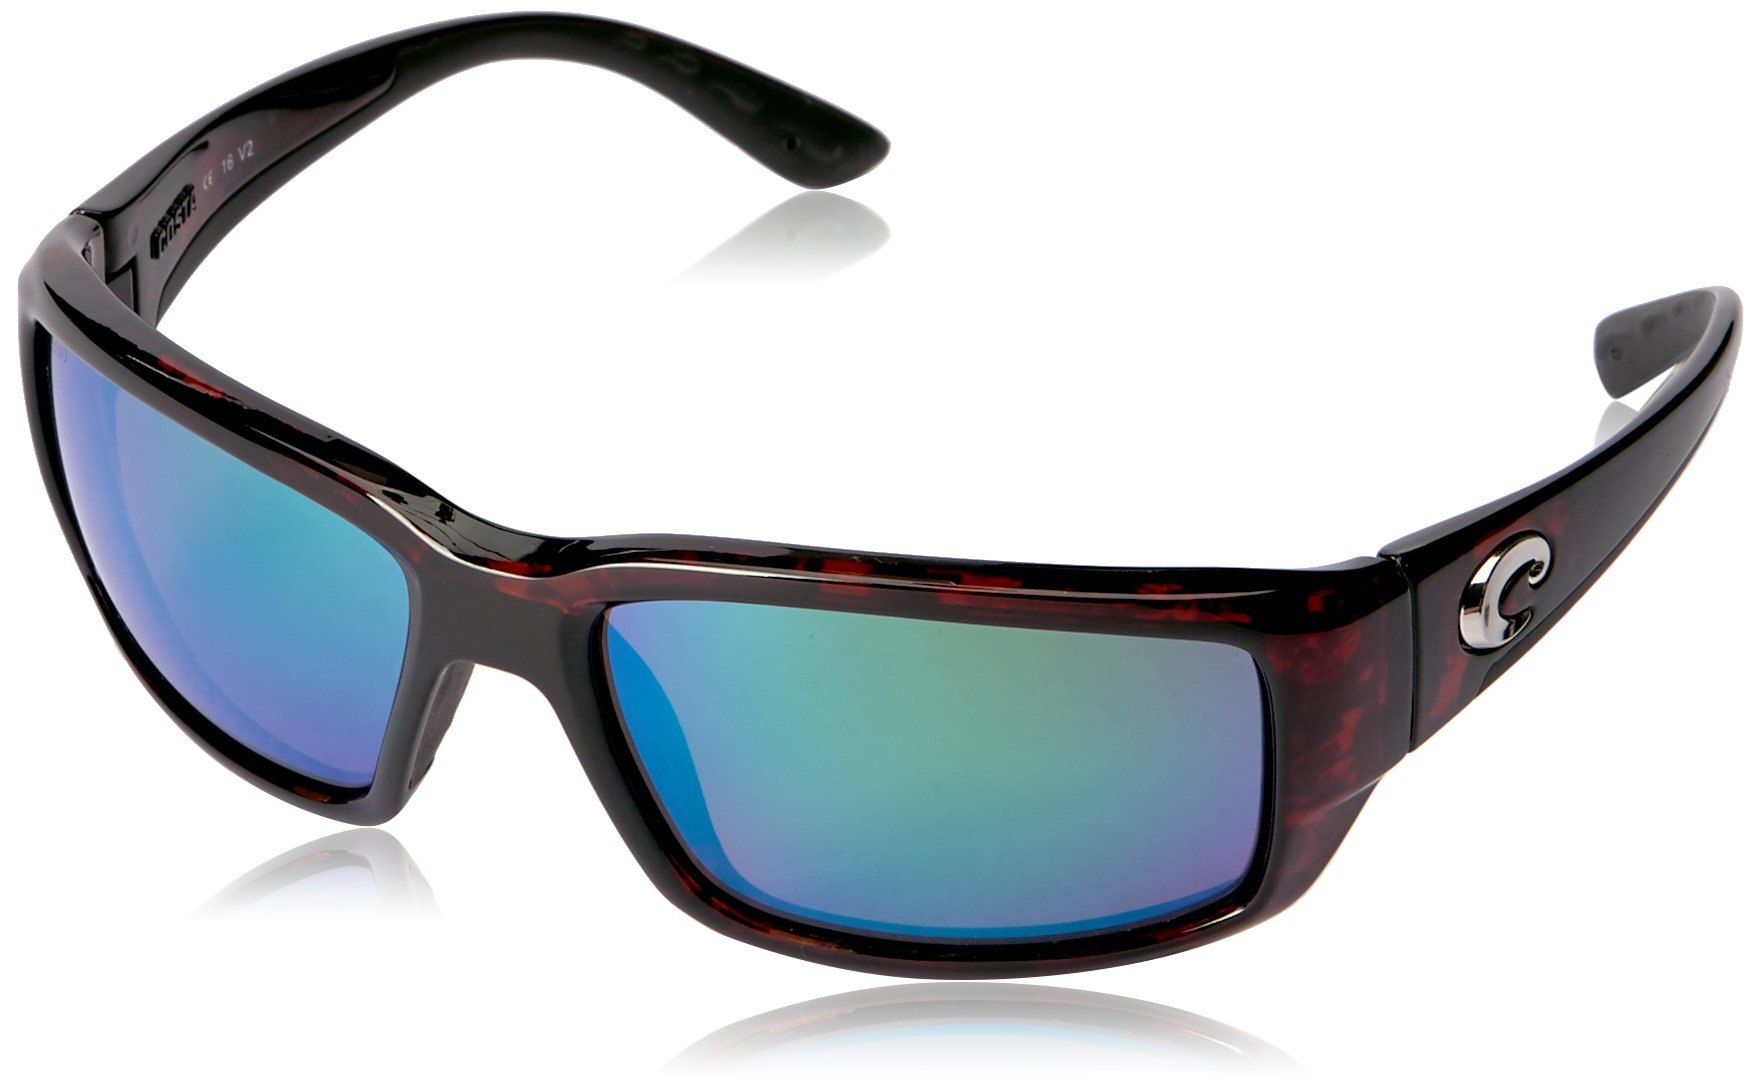 Costa del Mar Unisex-Adult Fantail TF 10 OGMGLP Polarized Iridium Rectangular Sunglasses, Tortoise, 59.3 mm by Costa Del Mar